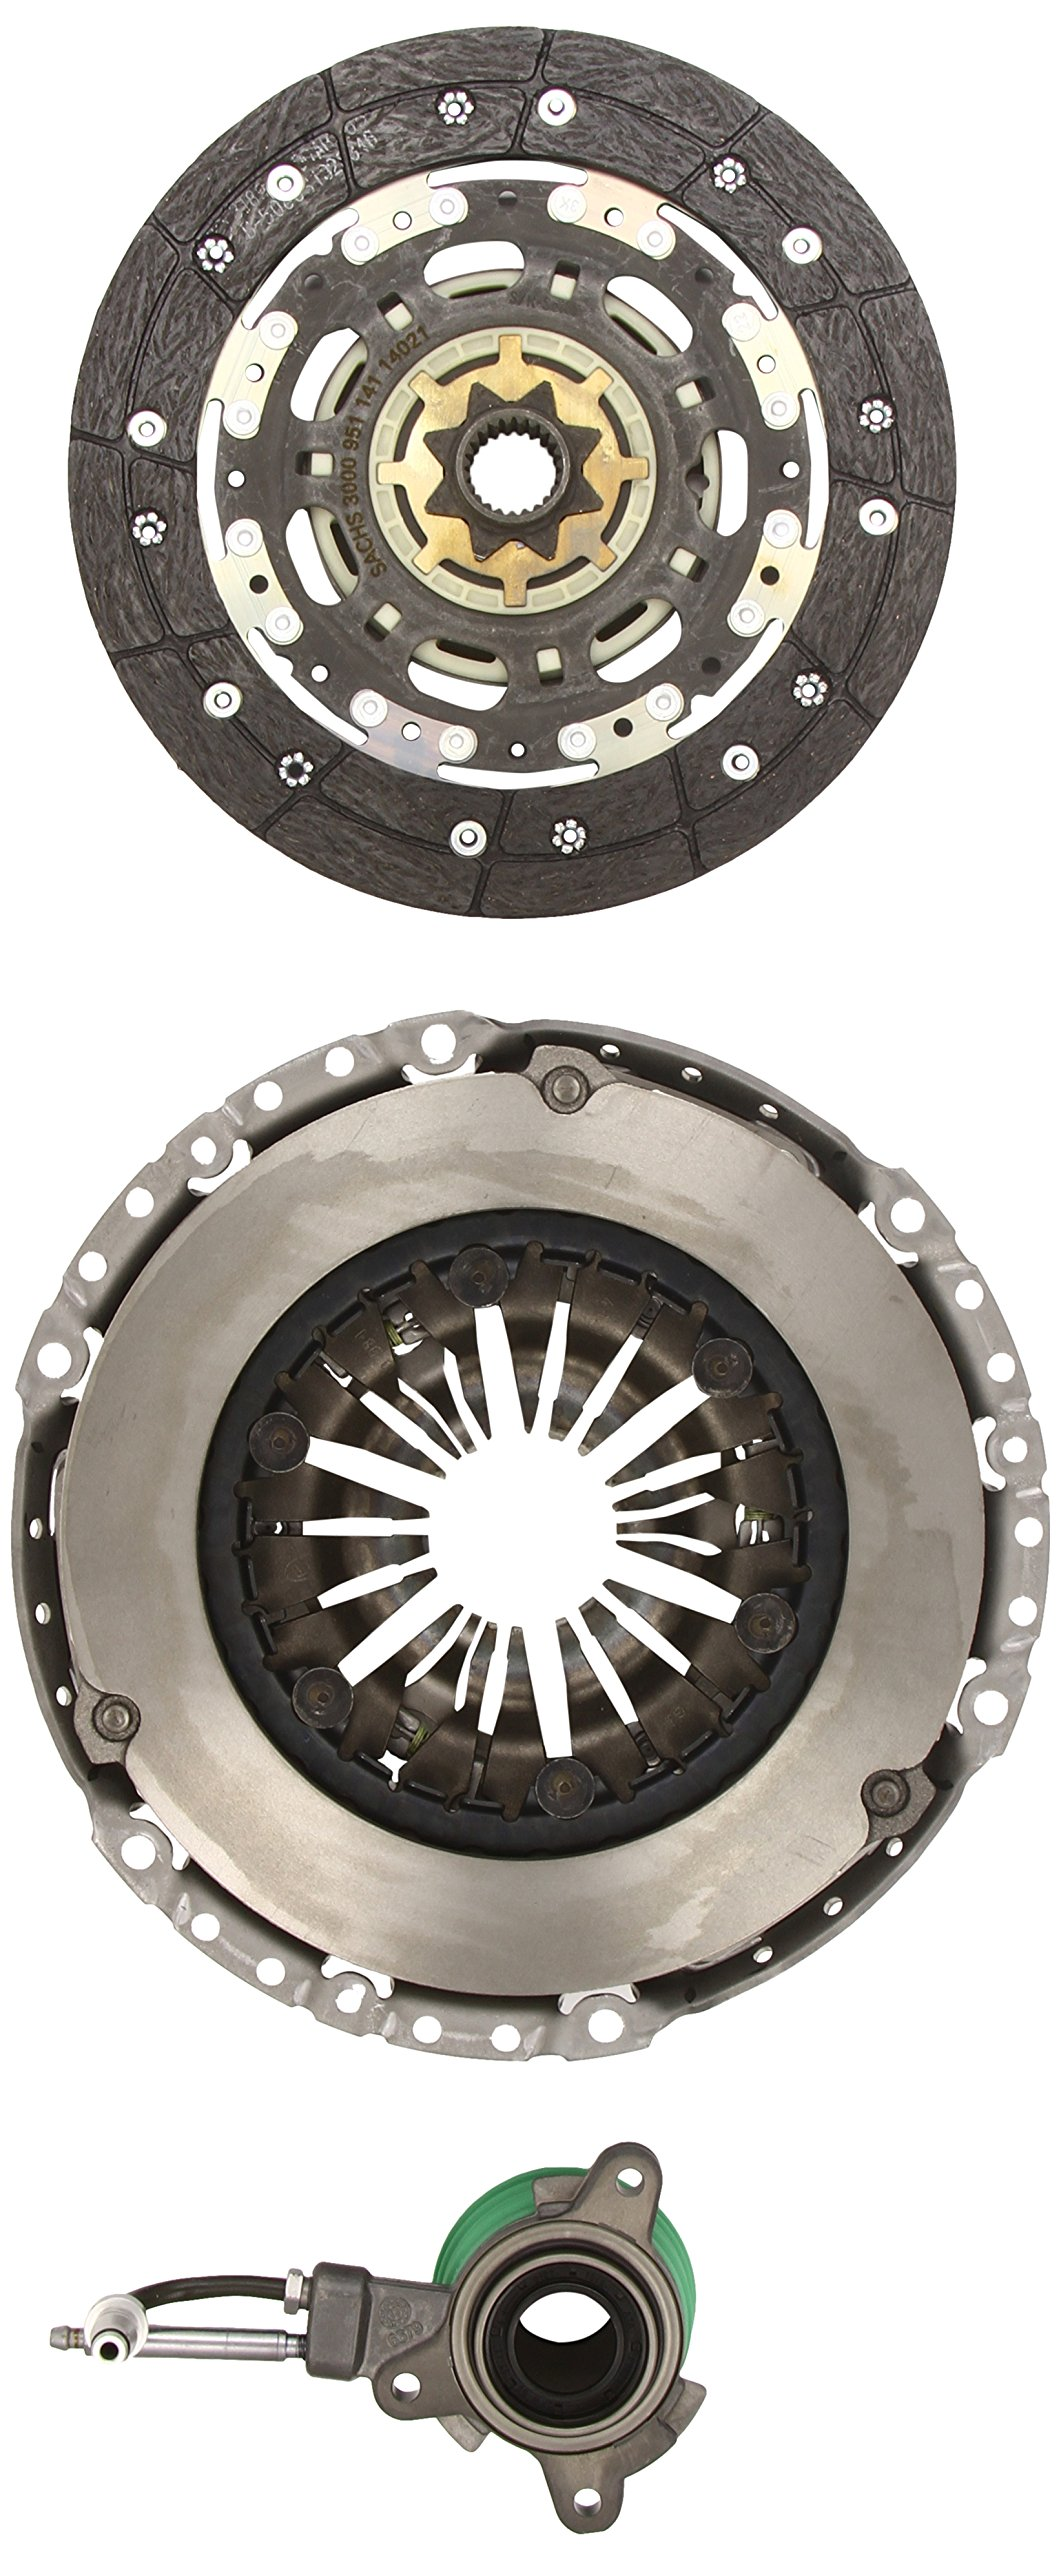 Sachs XTend 3000 990 113 Kit Plus Concentric Slave Cylinder CSC Clutch Cover